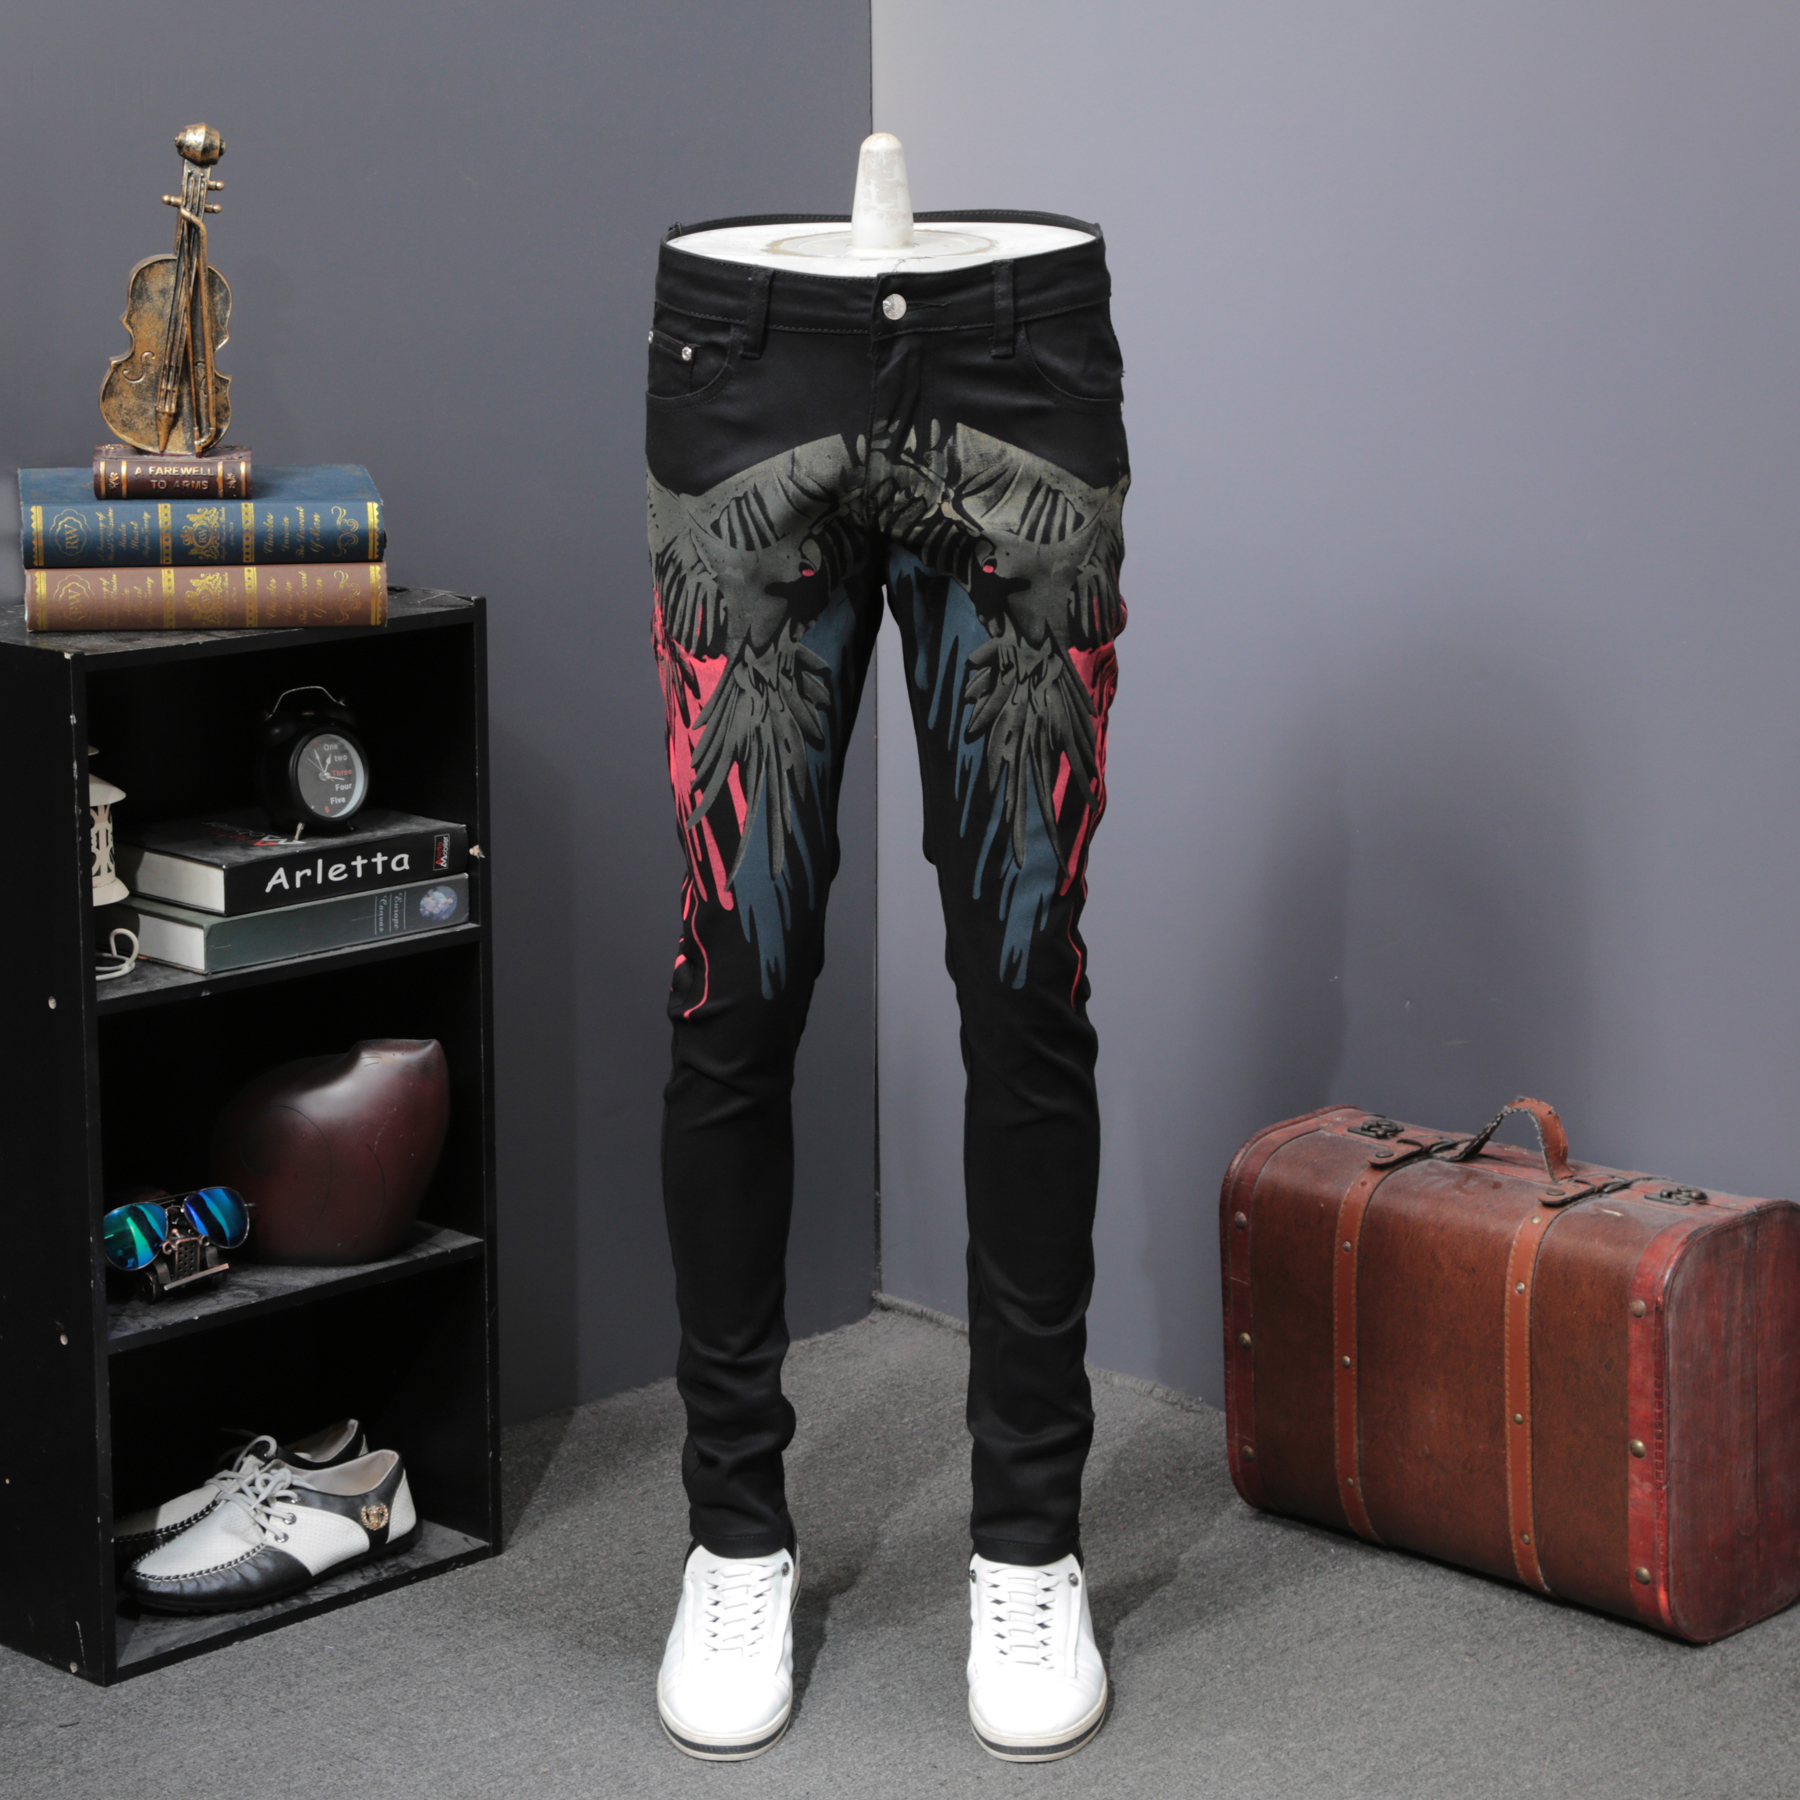 Hot Sale Jeans Men Fashion 2019 Spring Flower Printing Mens Jeans Slim Fit Casual Streetwear Denim Pants Men Clothes Jean Homme